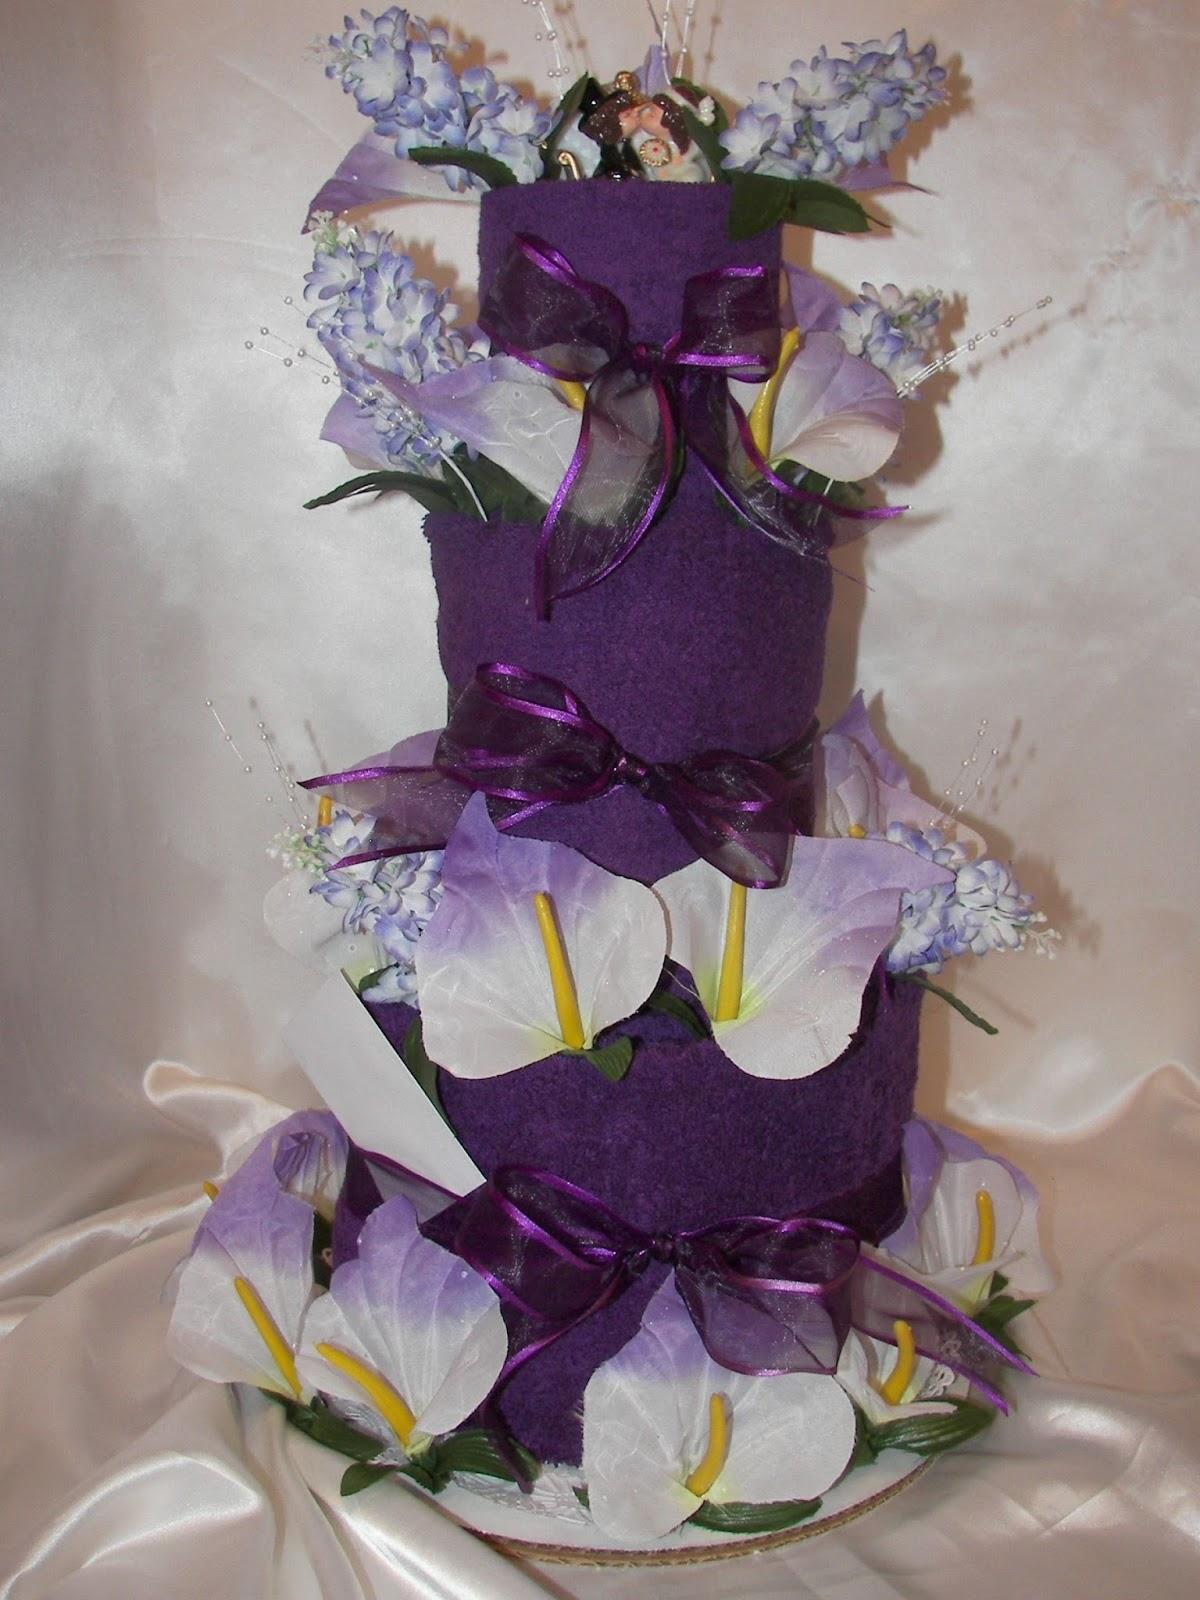 Cake Decorating Ideas Bridal Shower : 10 Pretty Bridal Shower Cakes Designs Ideas CAKE DESIGN AND DECORATING IDEAS